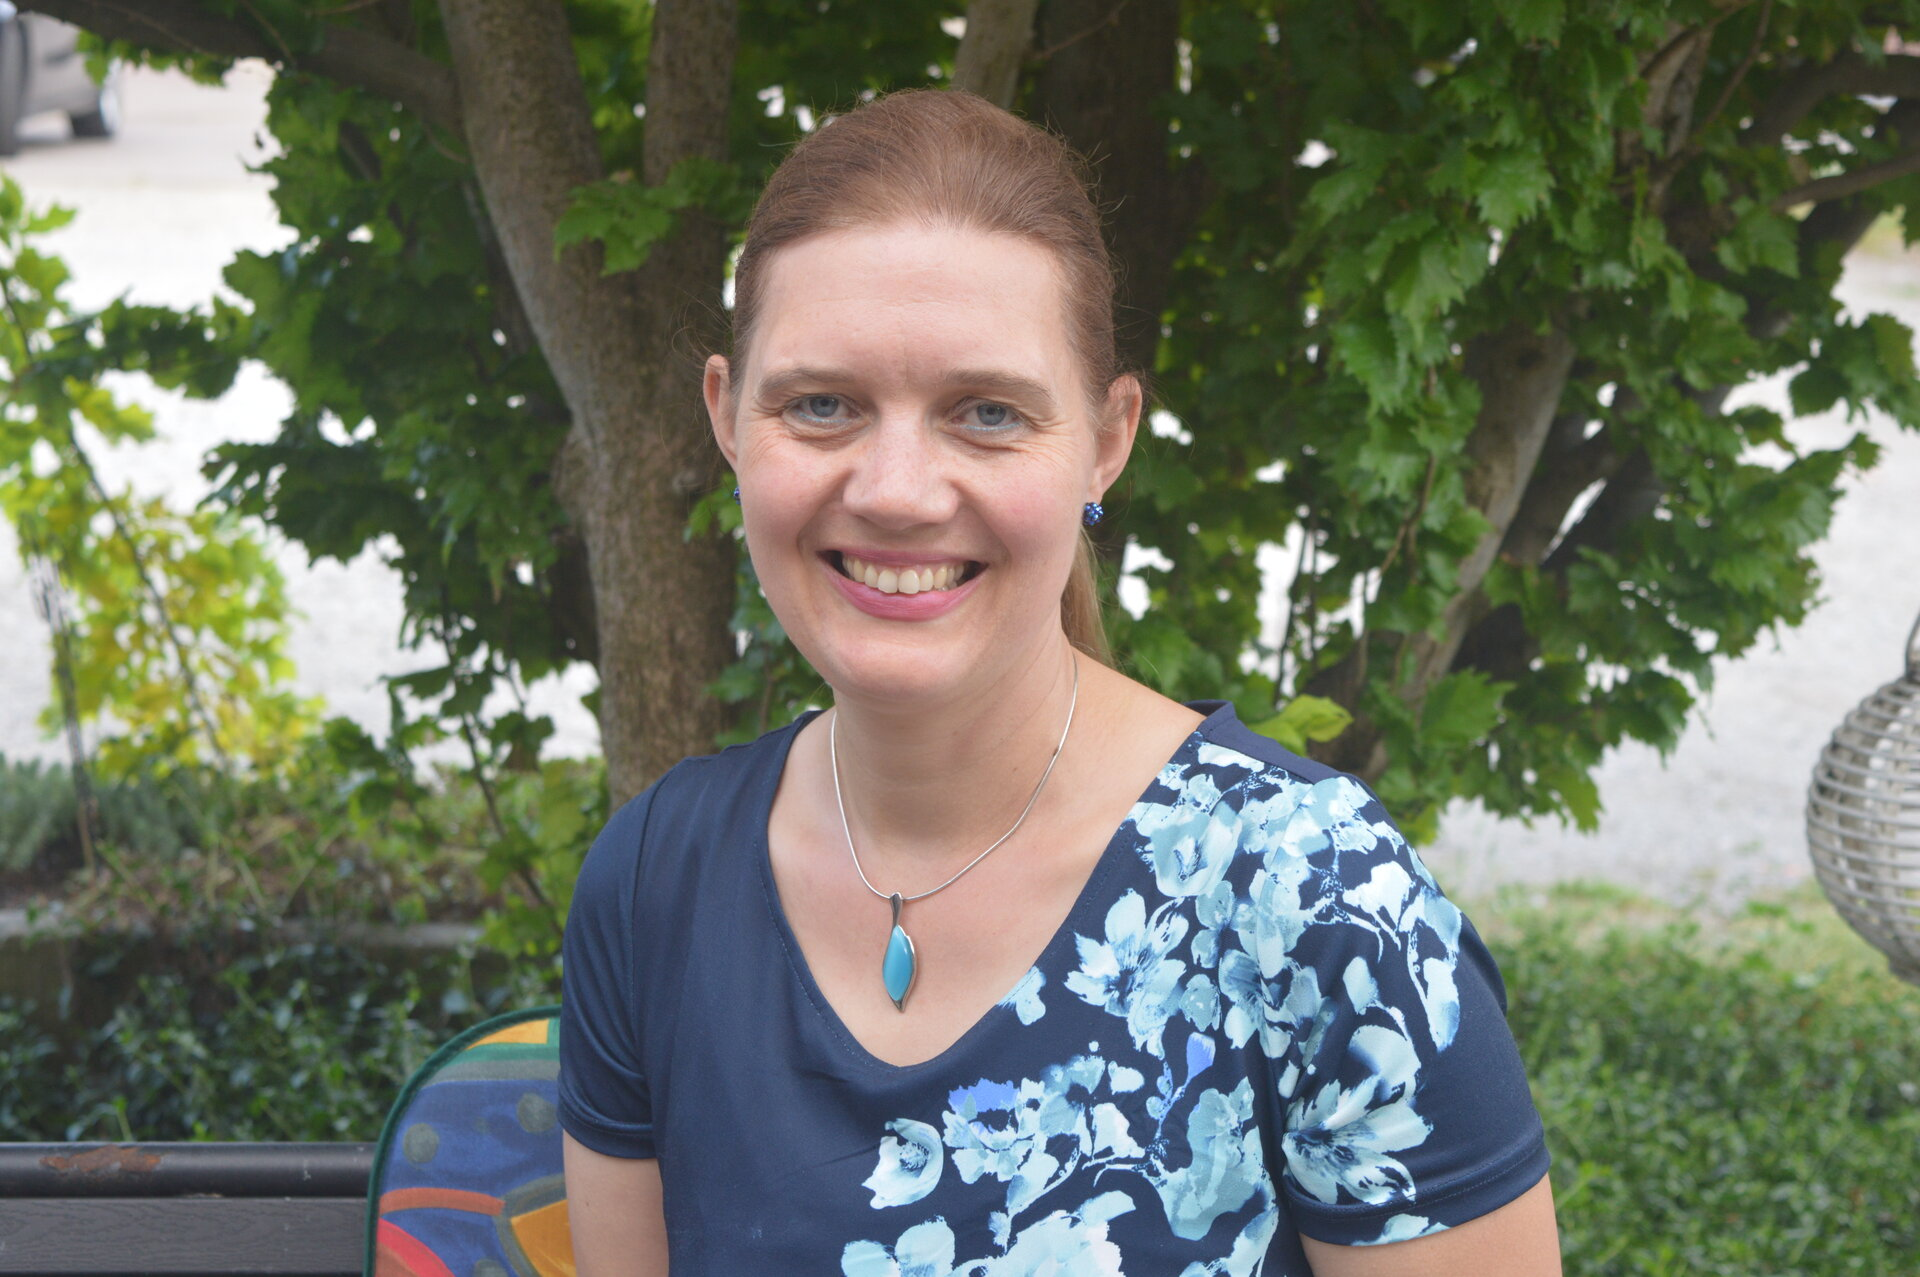 Silvia Eberlin